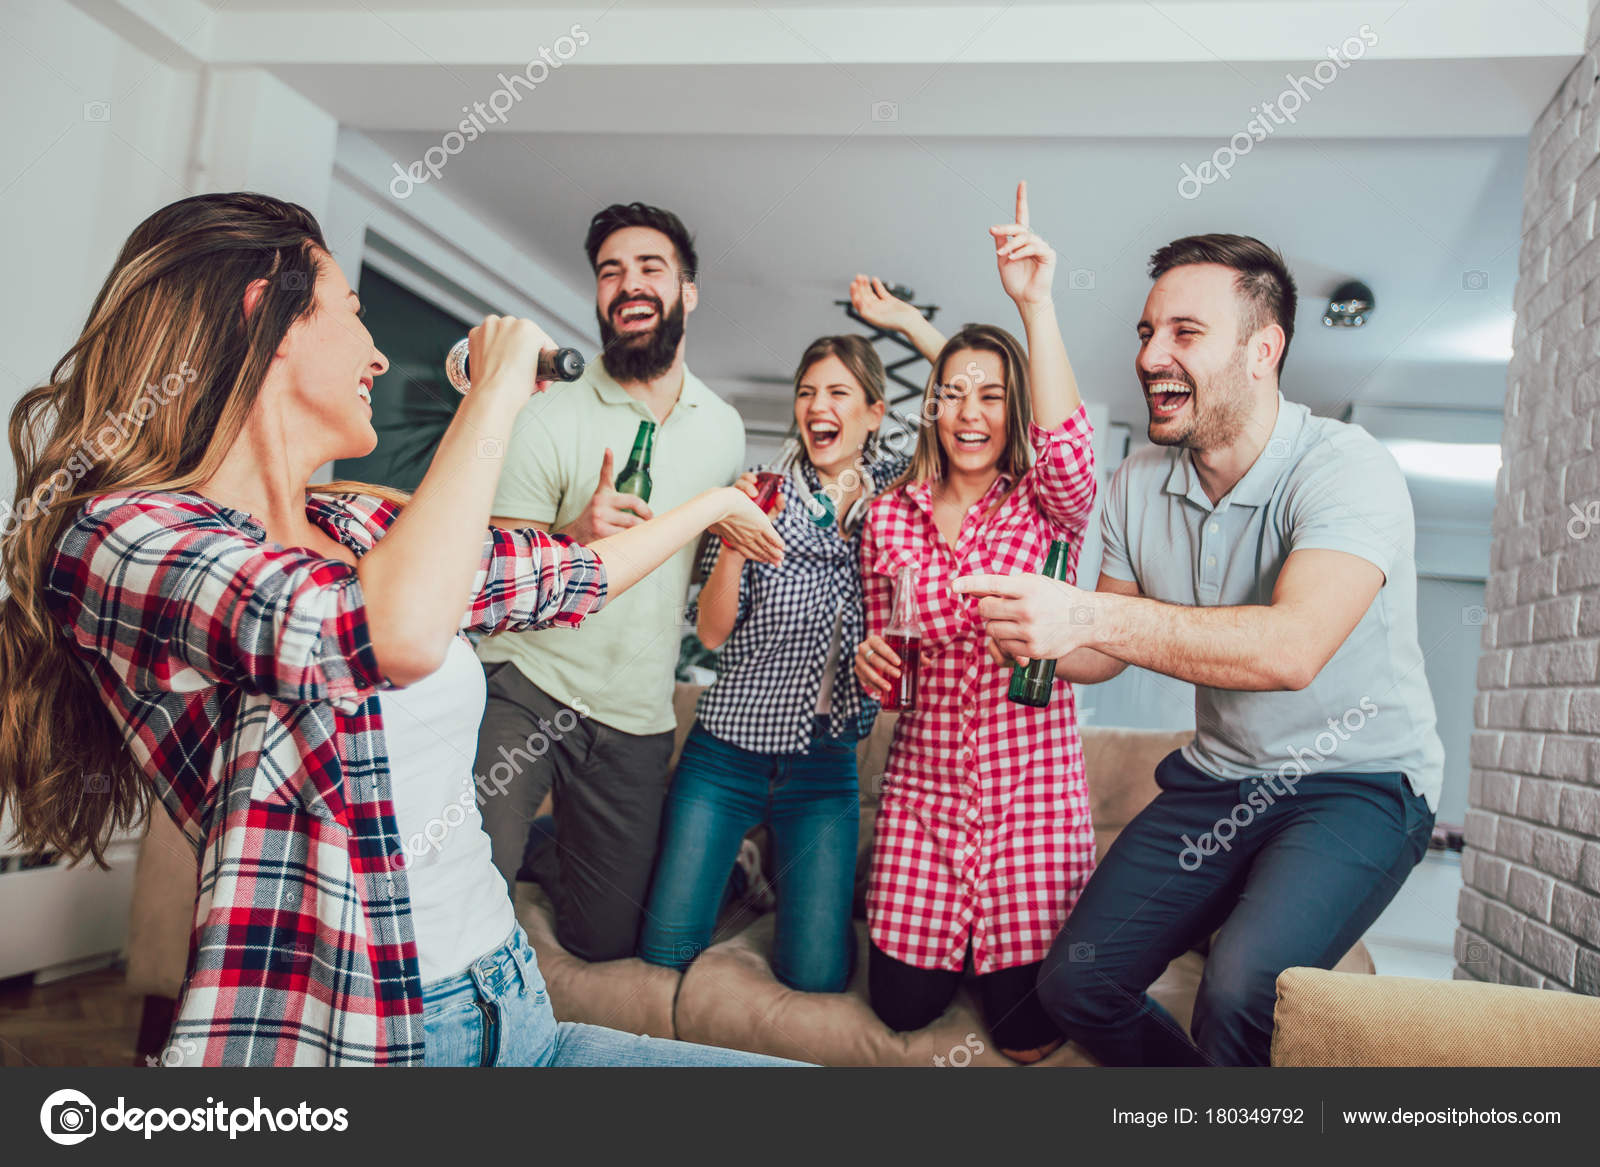 Grupo amigos jugando karaoke casa concepto sobre amistad entretenimiento hogar fotos de stock - Karaoke en casa ...